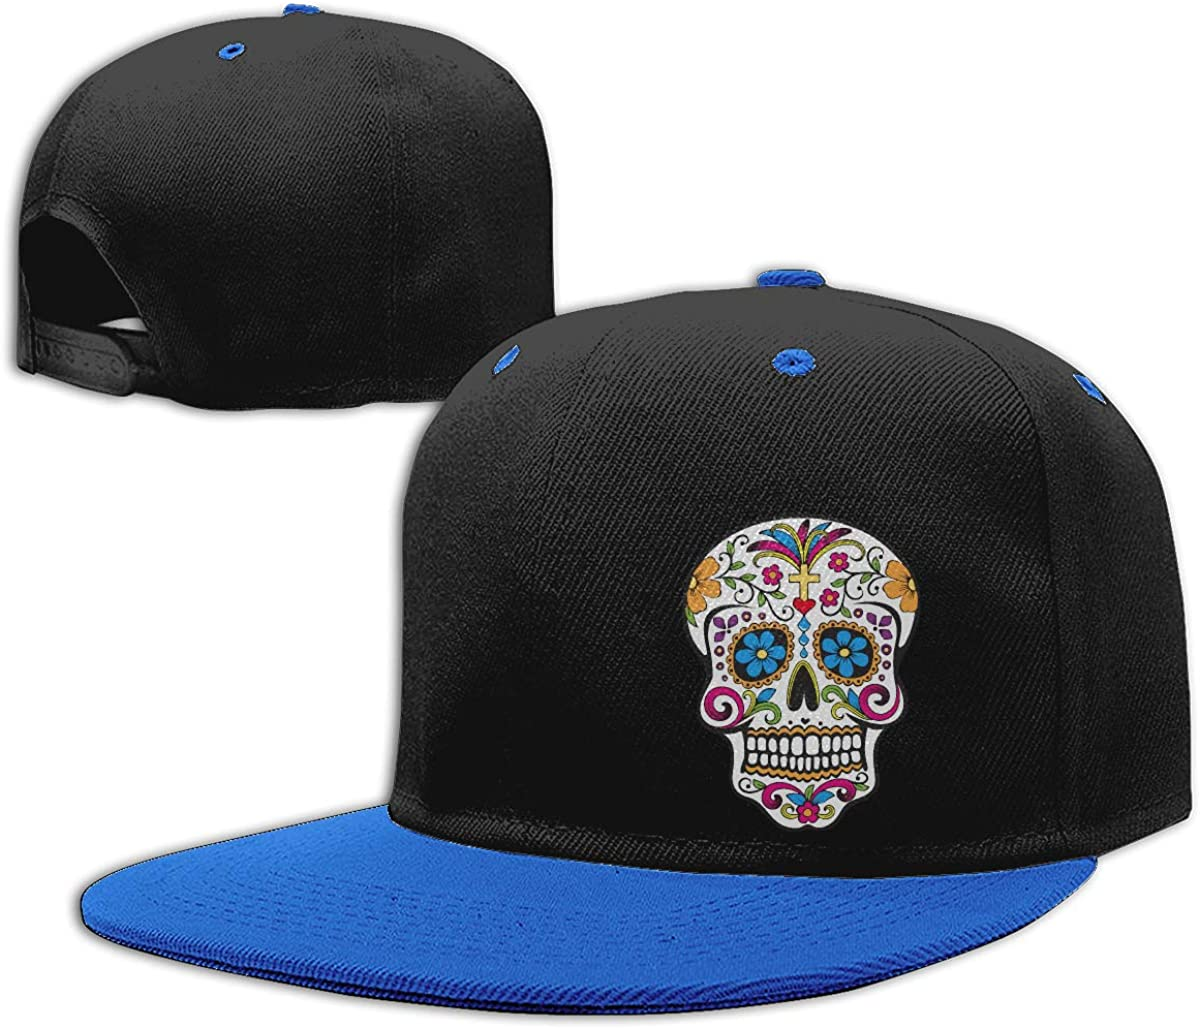 Mexican Skull Adjustable Flat Brim Baseball Caps NMG-01 Men Womens Plain Cap